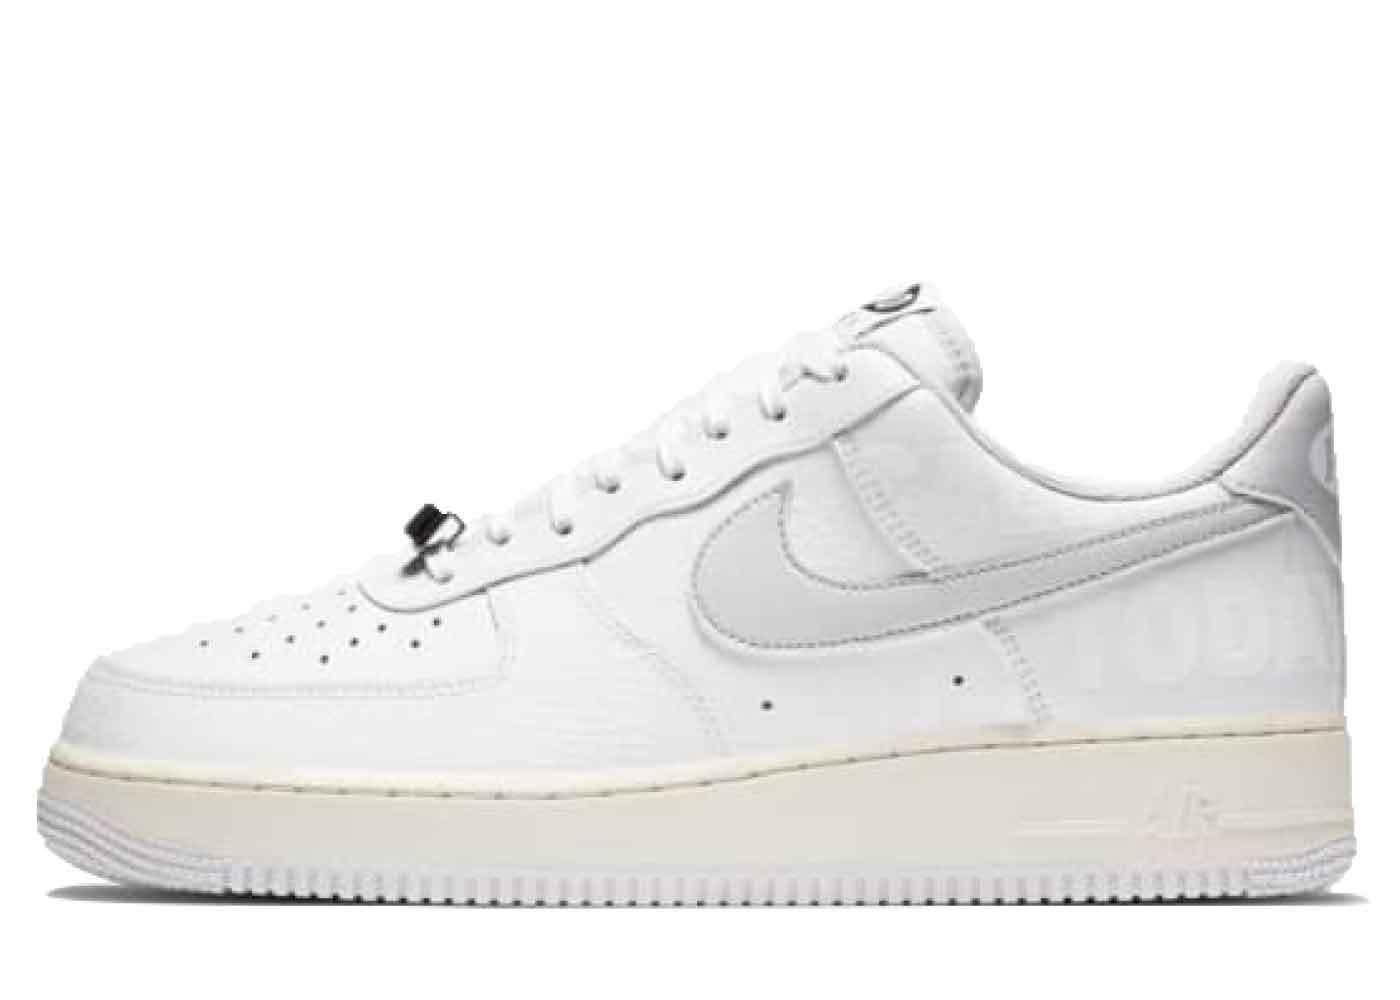 Nike Air Force 1 07 Low 1-800の写真